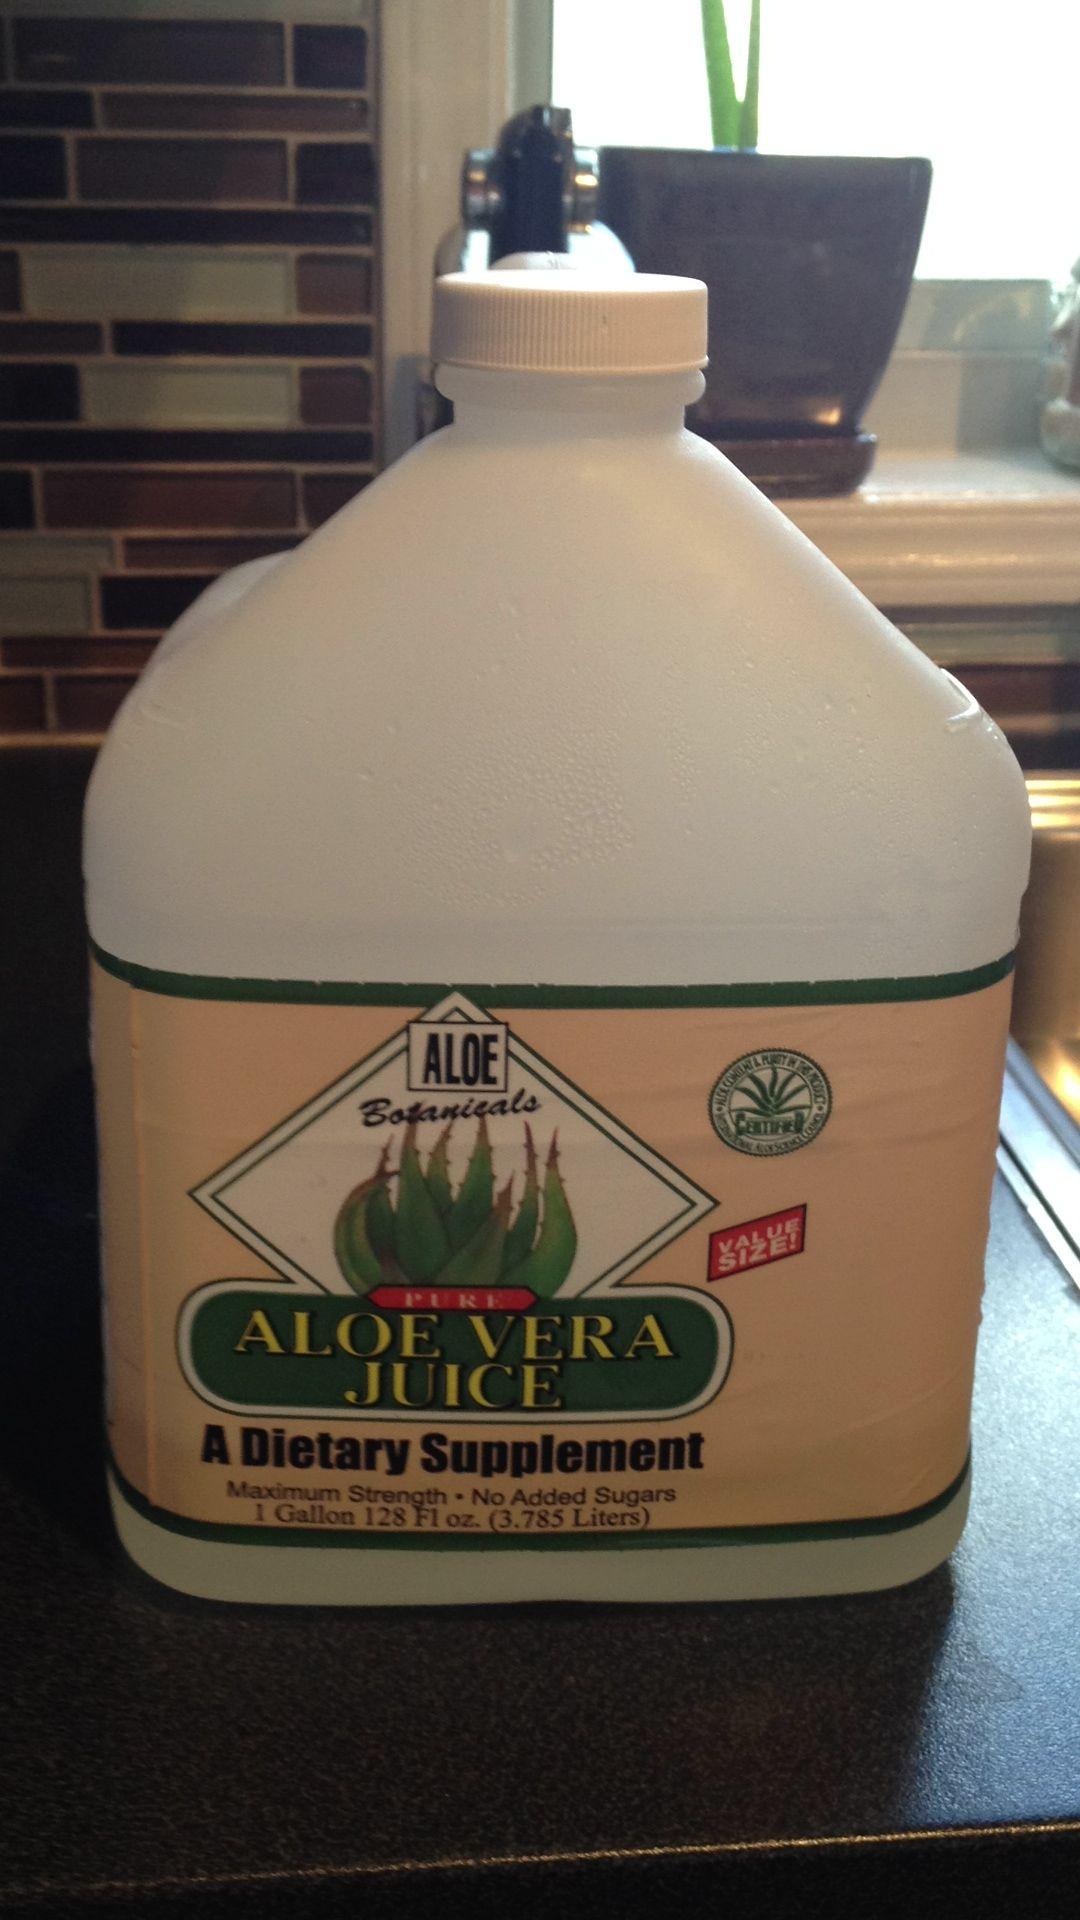 Aloe vera juice love it such a great feeling after